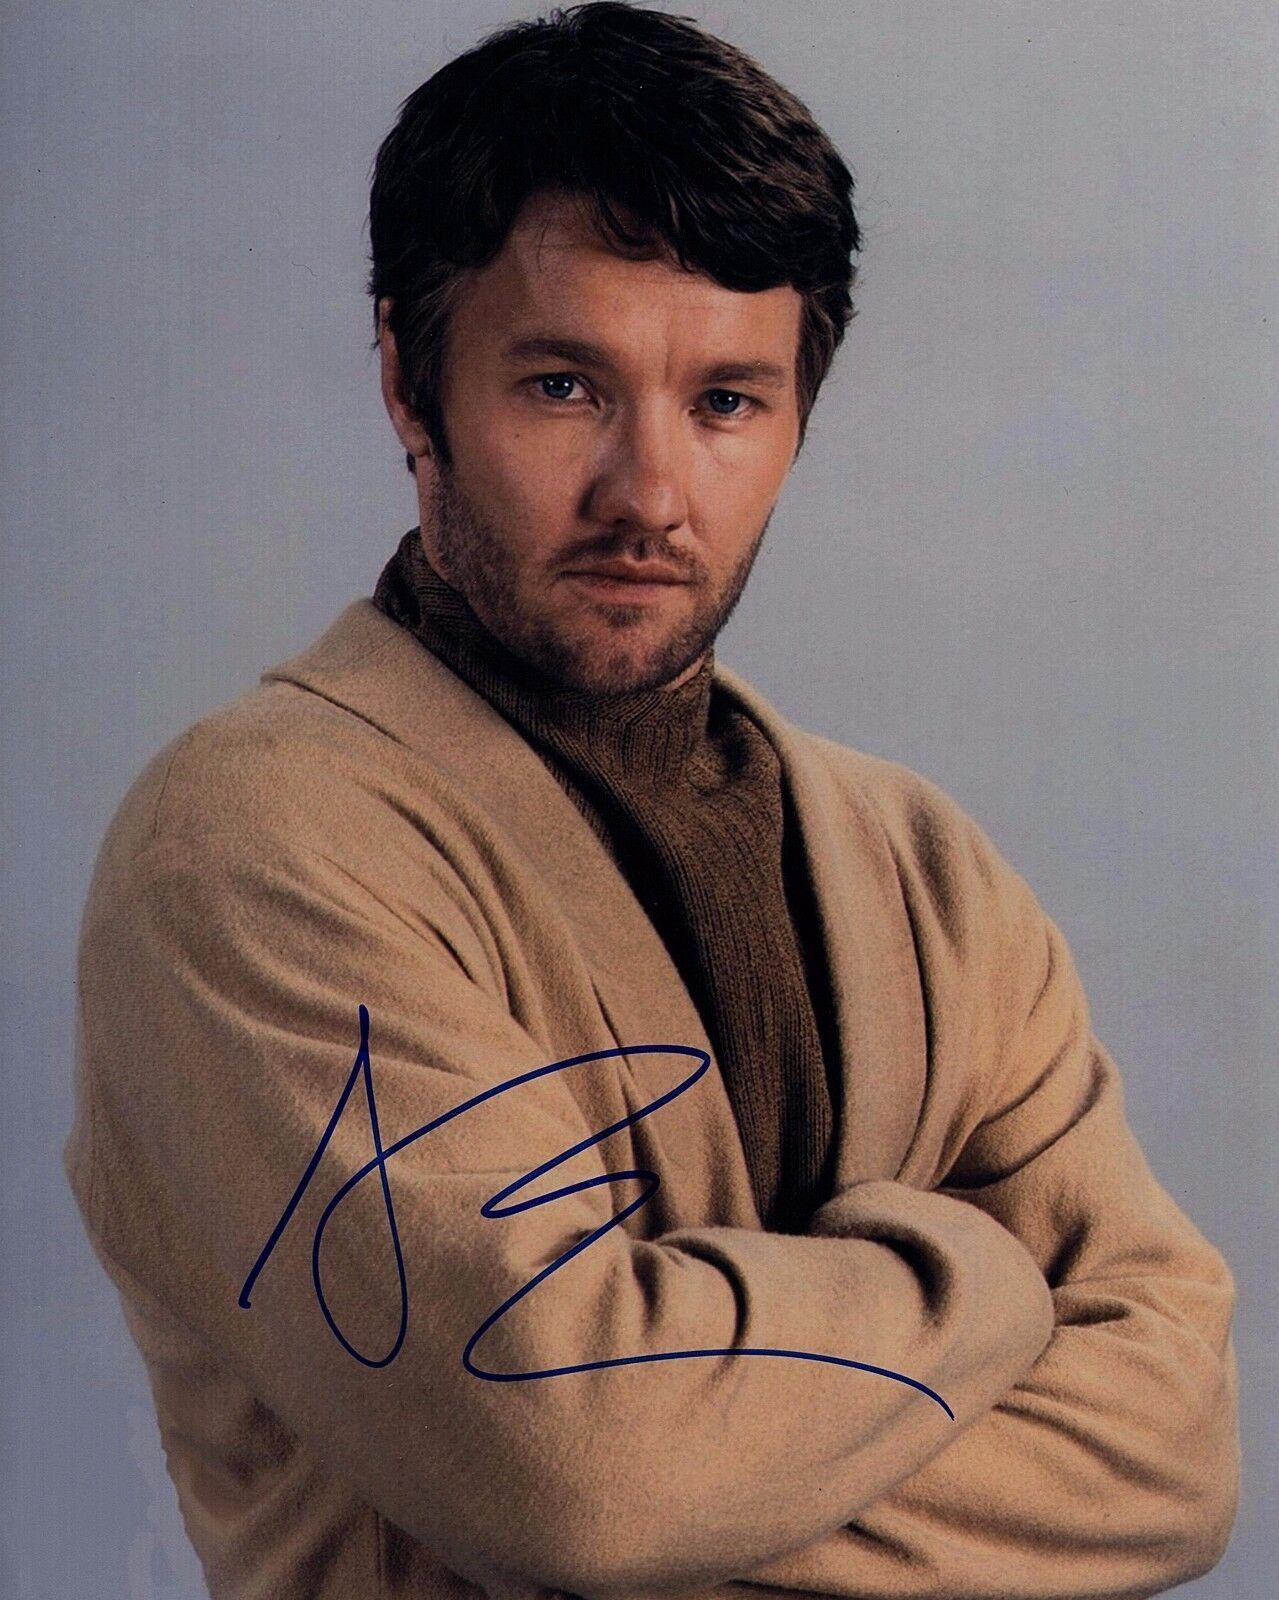 Joel Edgerton Signed Star Wars Photo 8x10 Owen Lars Autograph Revenge Of Sith Ebay